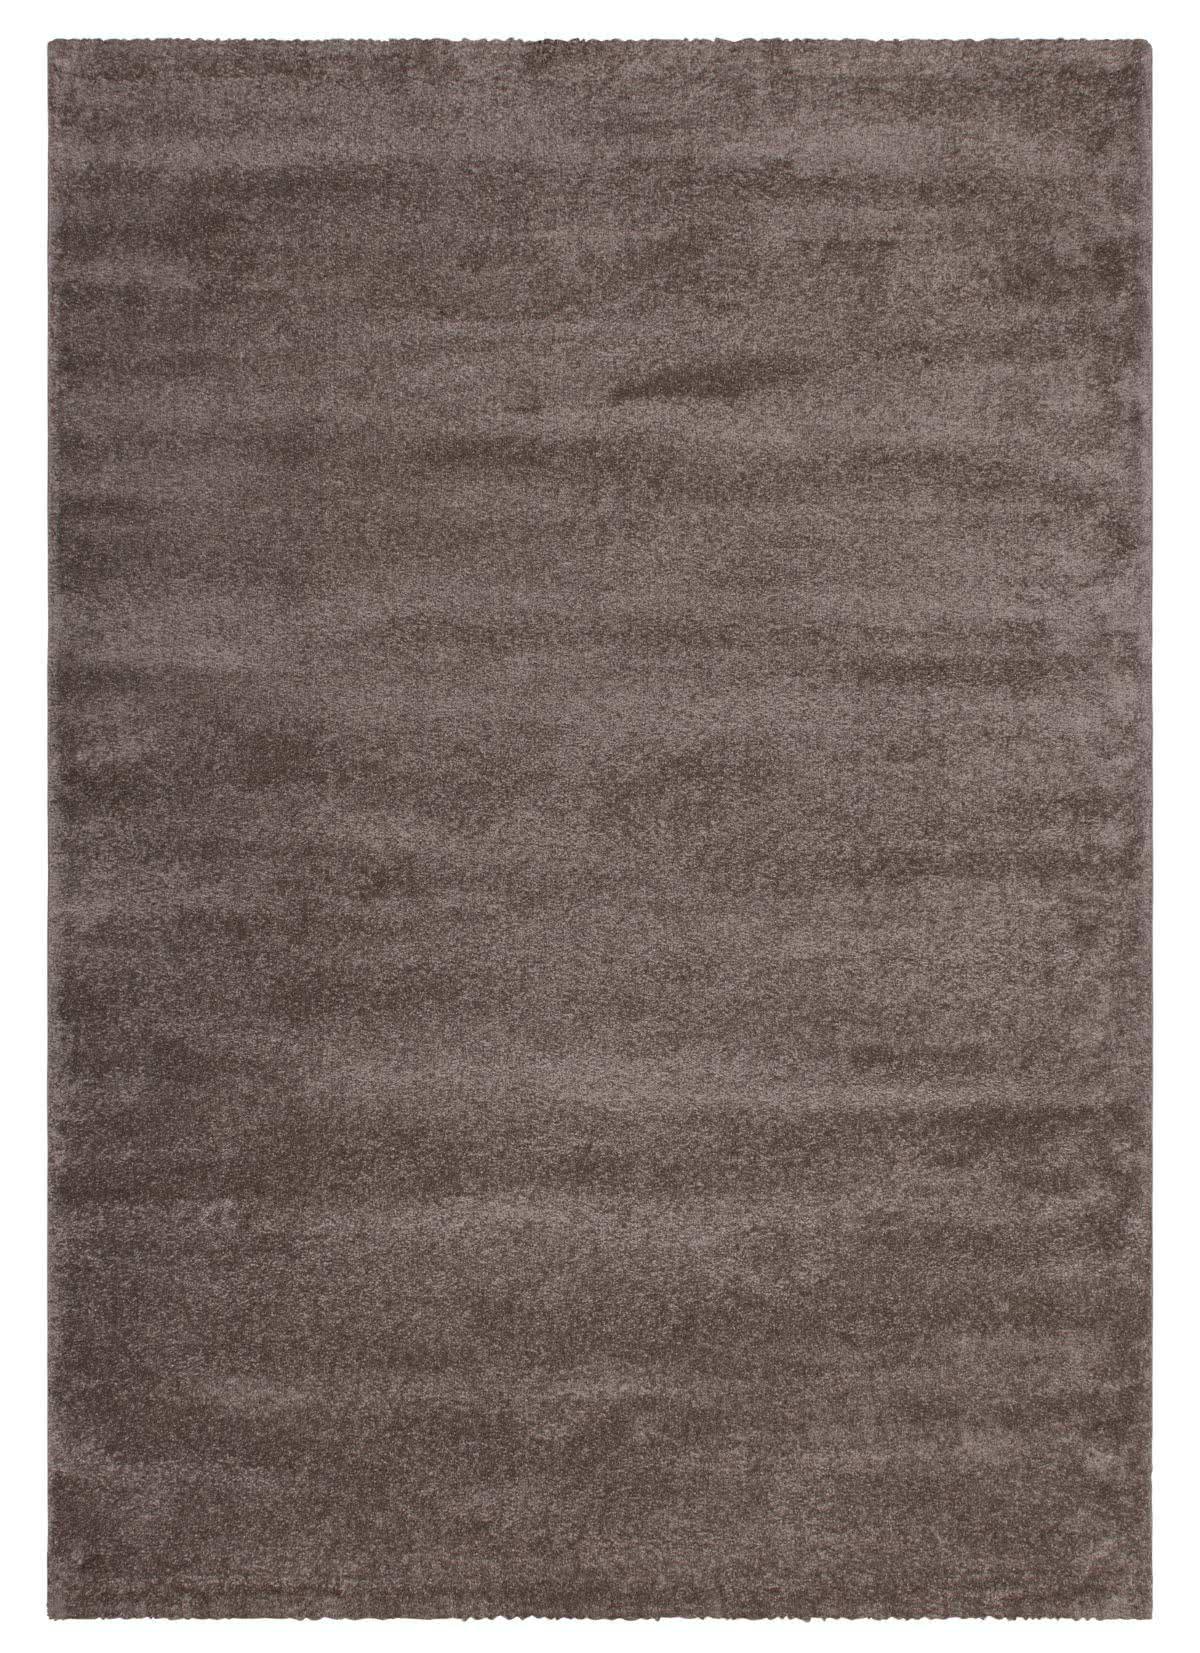 hochflor teppich sanssouci hellbraun nach ma gefertigt. Black Bedroom Furniture Sets. Home Design Ideas